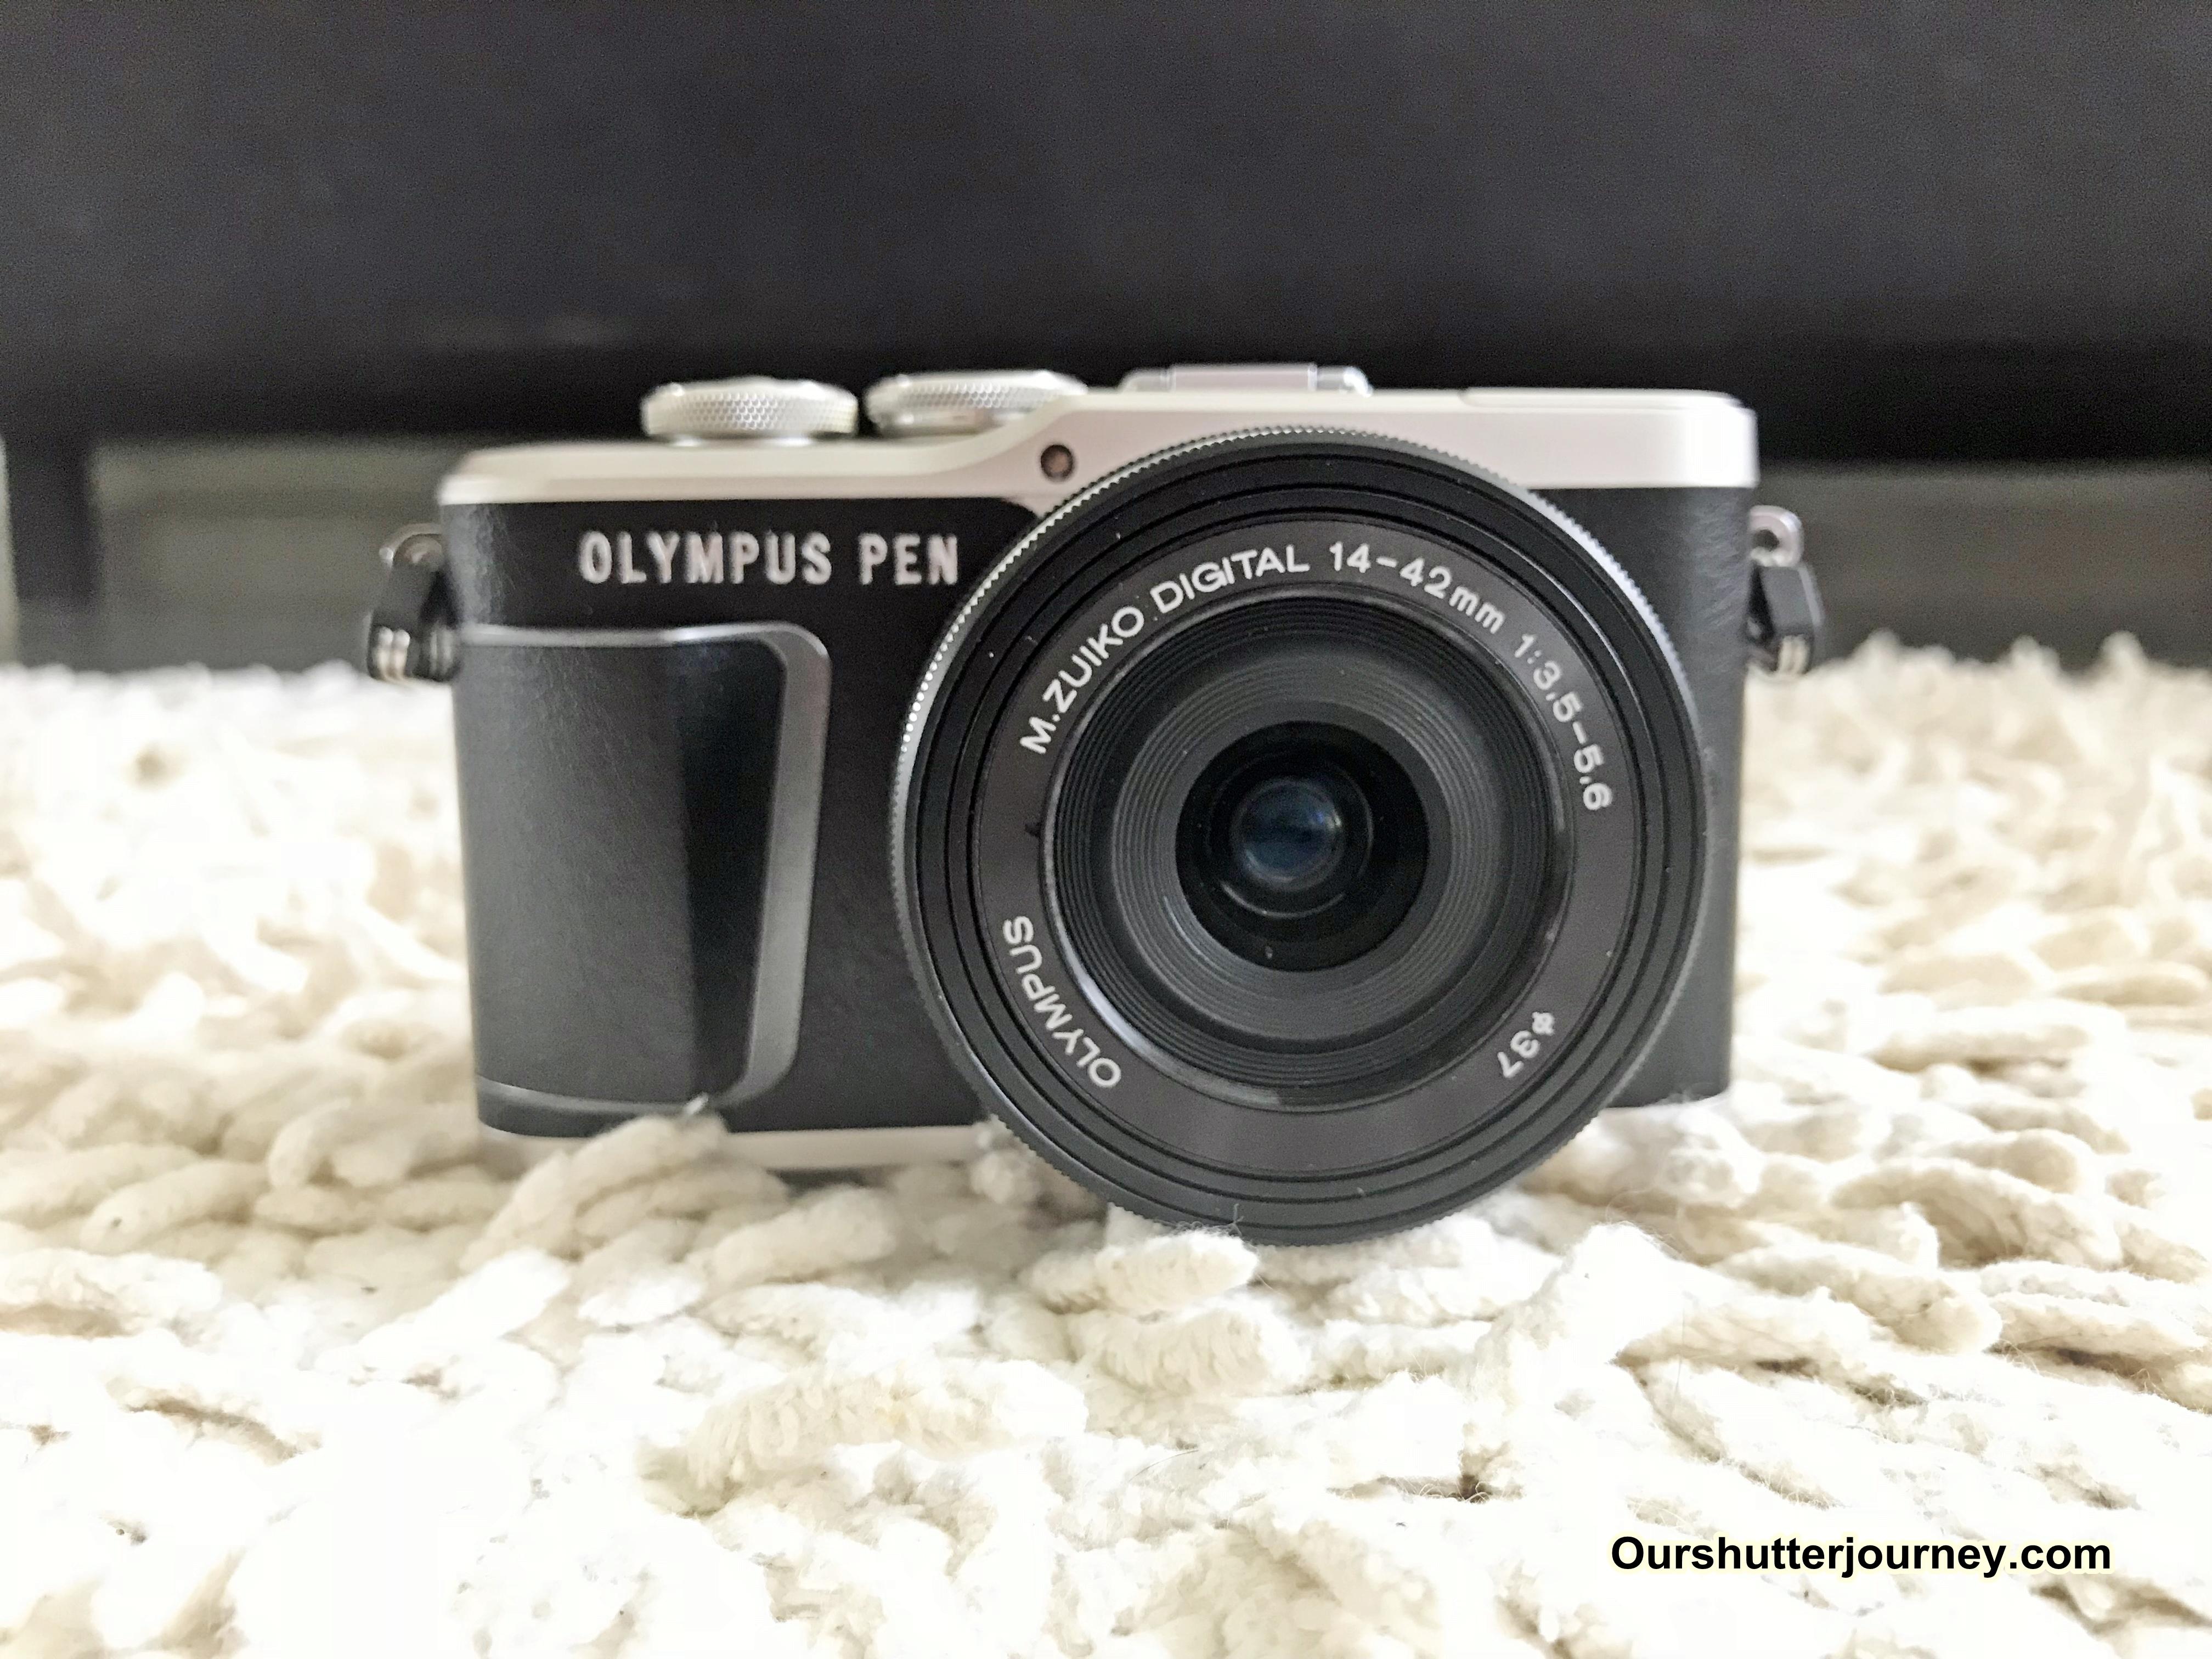 Https Sjs Events 2018 11 28t091901 0000 Olympus Mzuiko Digital Ed 12 50mm F35 63 Ez Lens Img 1504